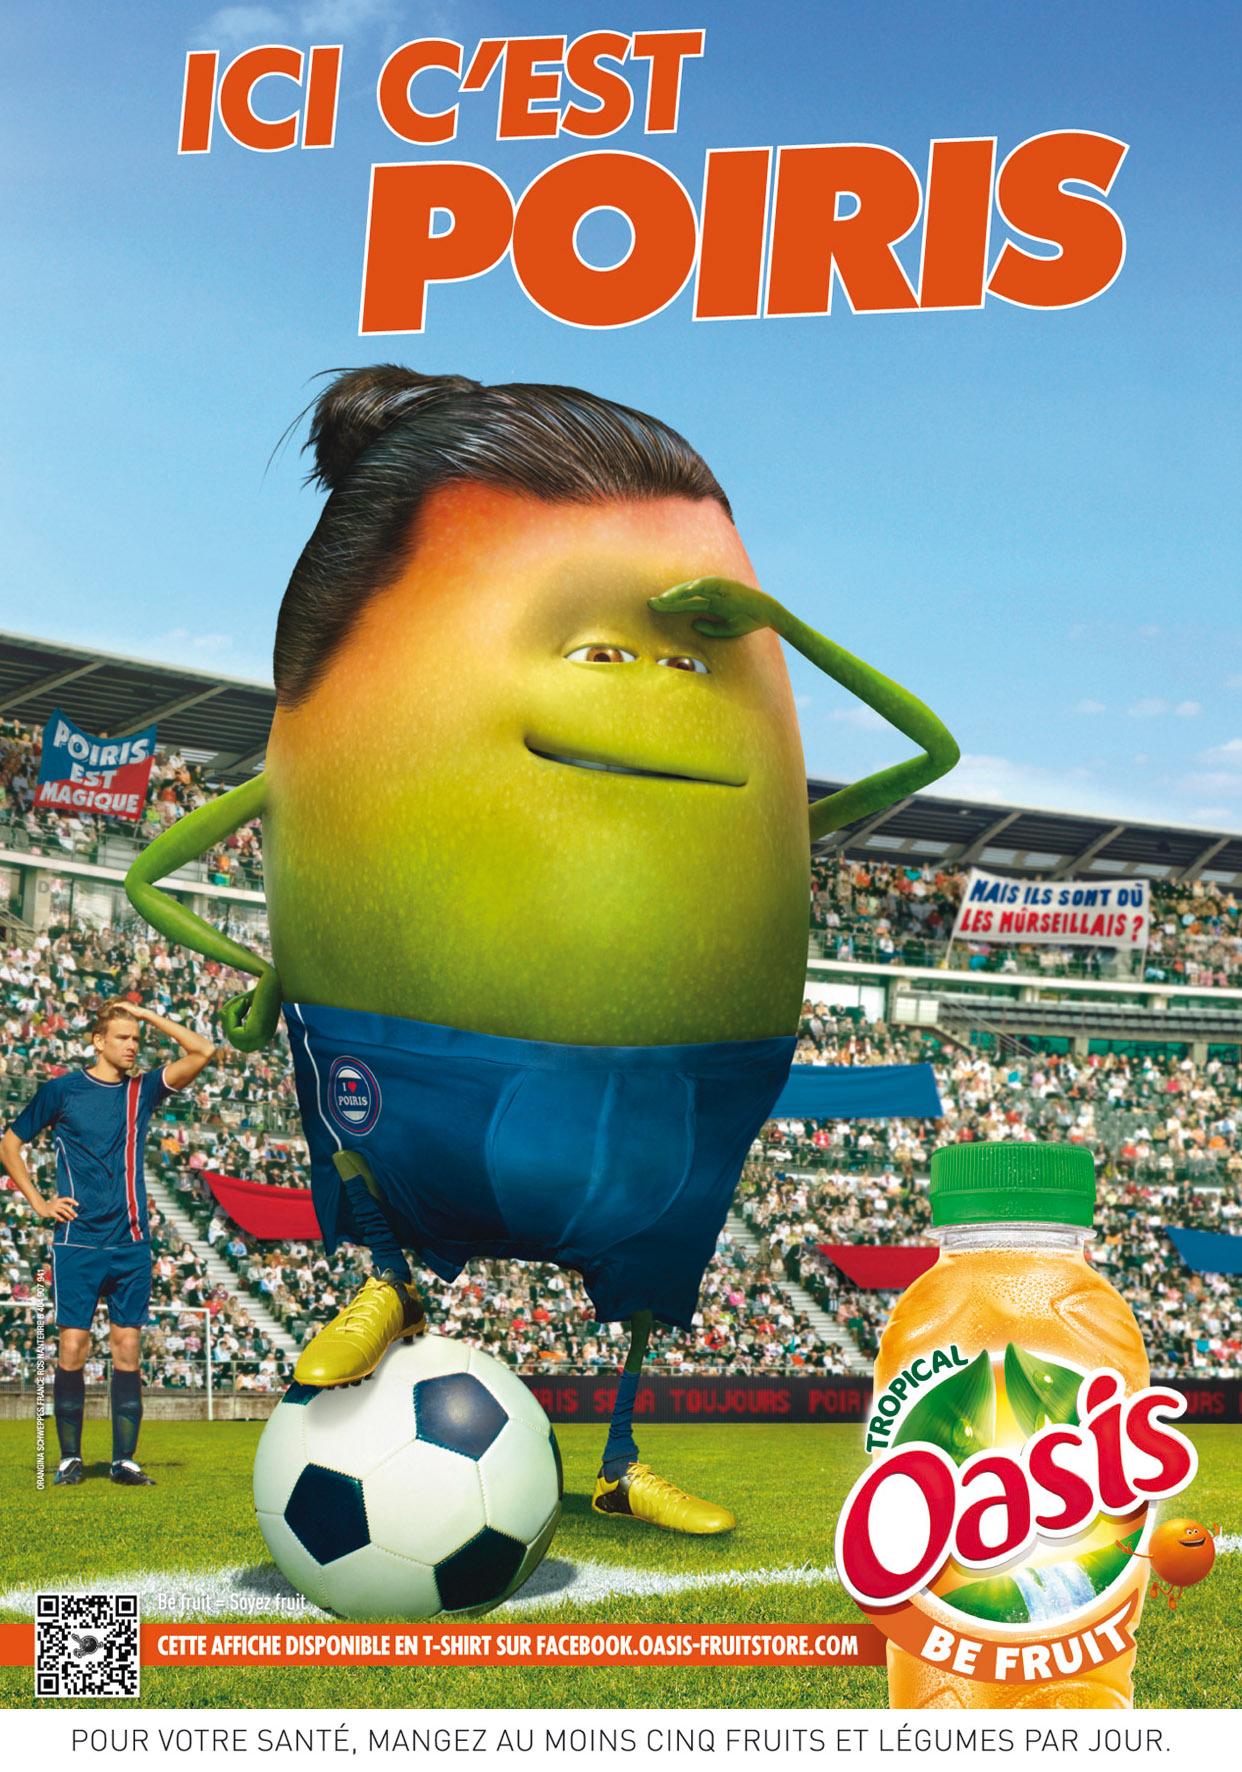 Oasis sort sa campagne Be Fruit et ses clins d'oeil foot